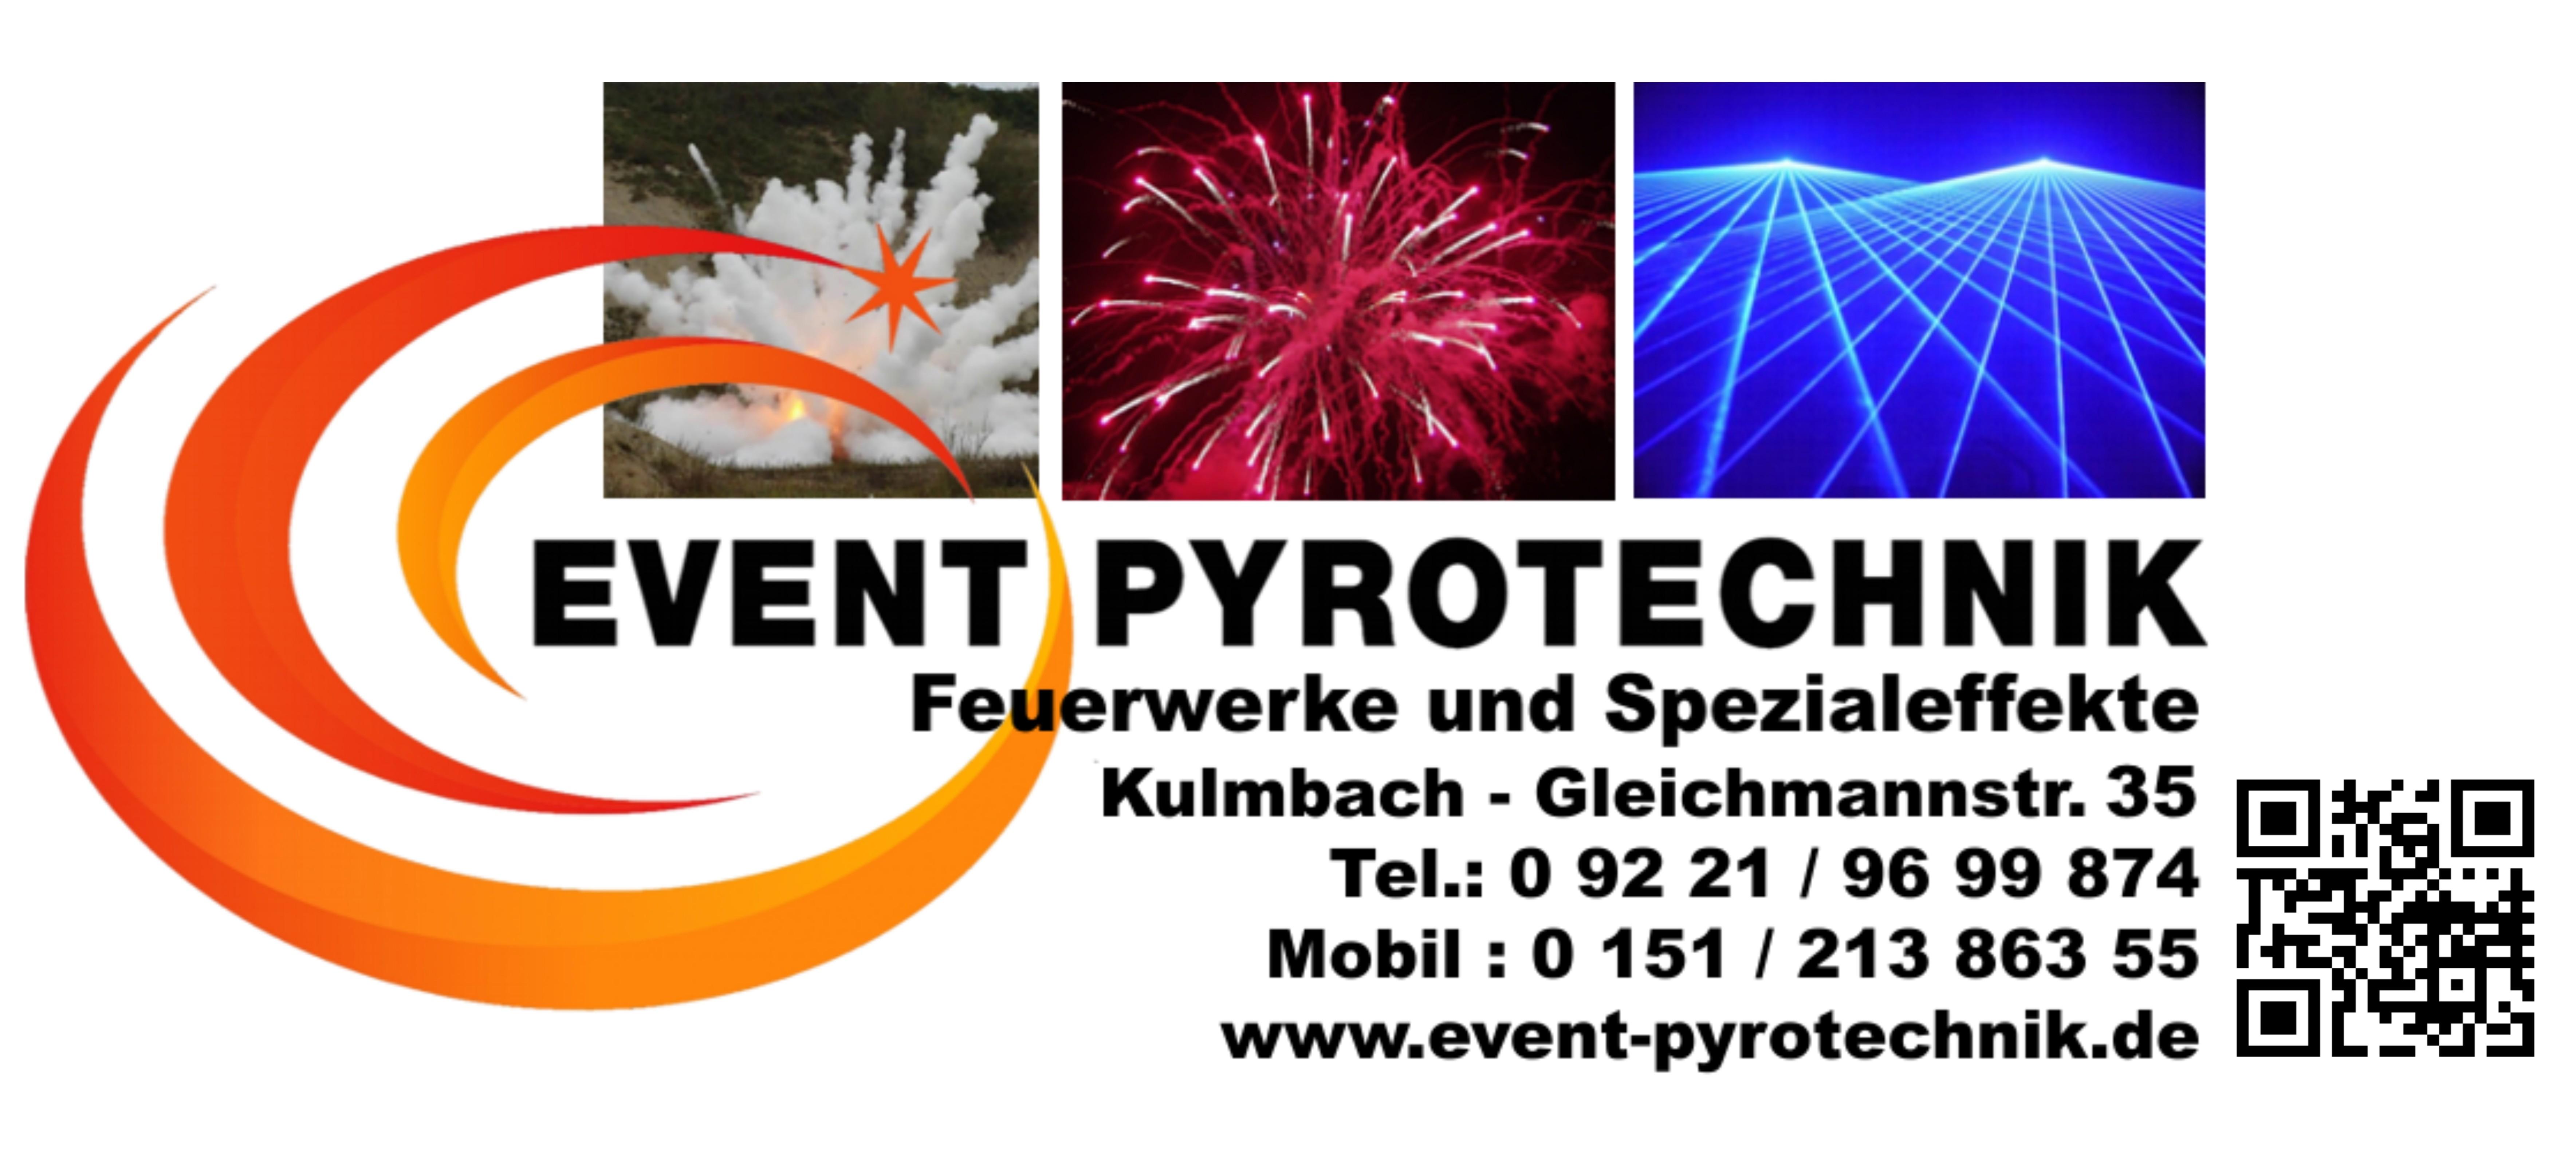 (c) Event-pyrotechnik.de